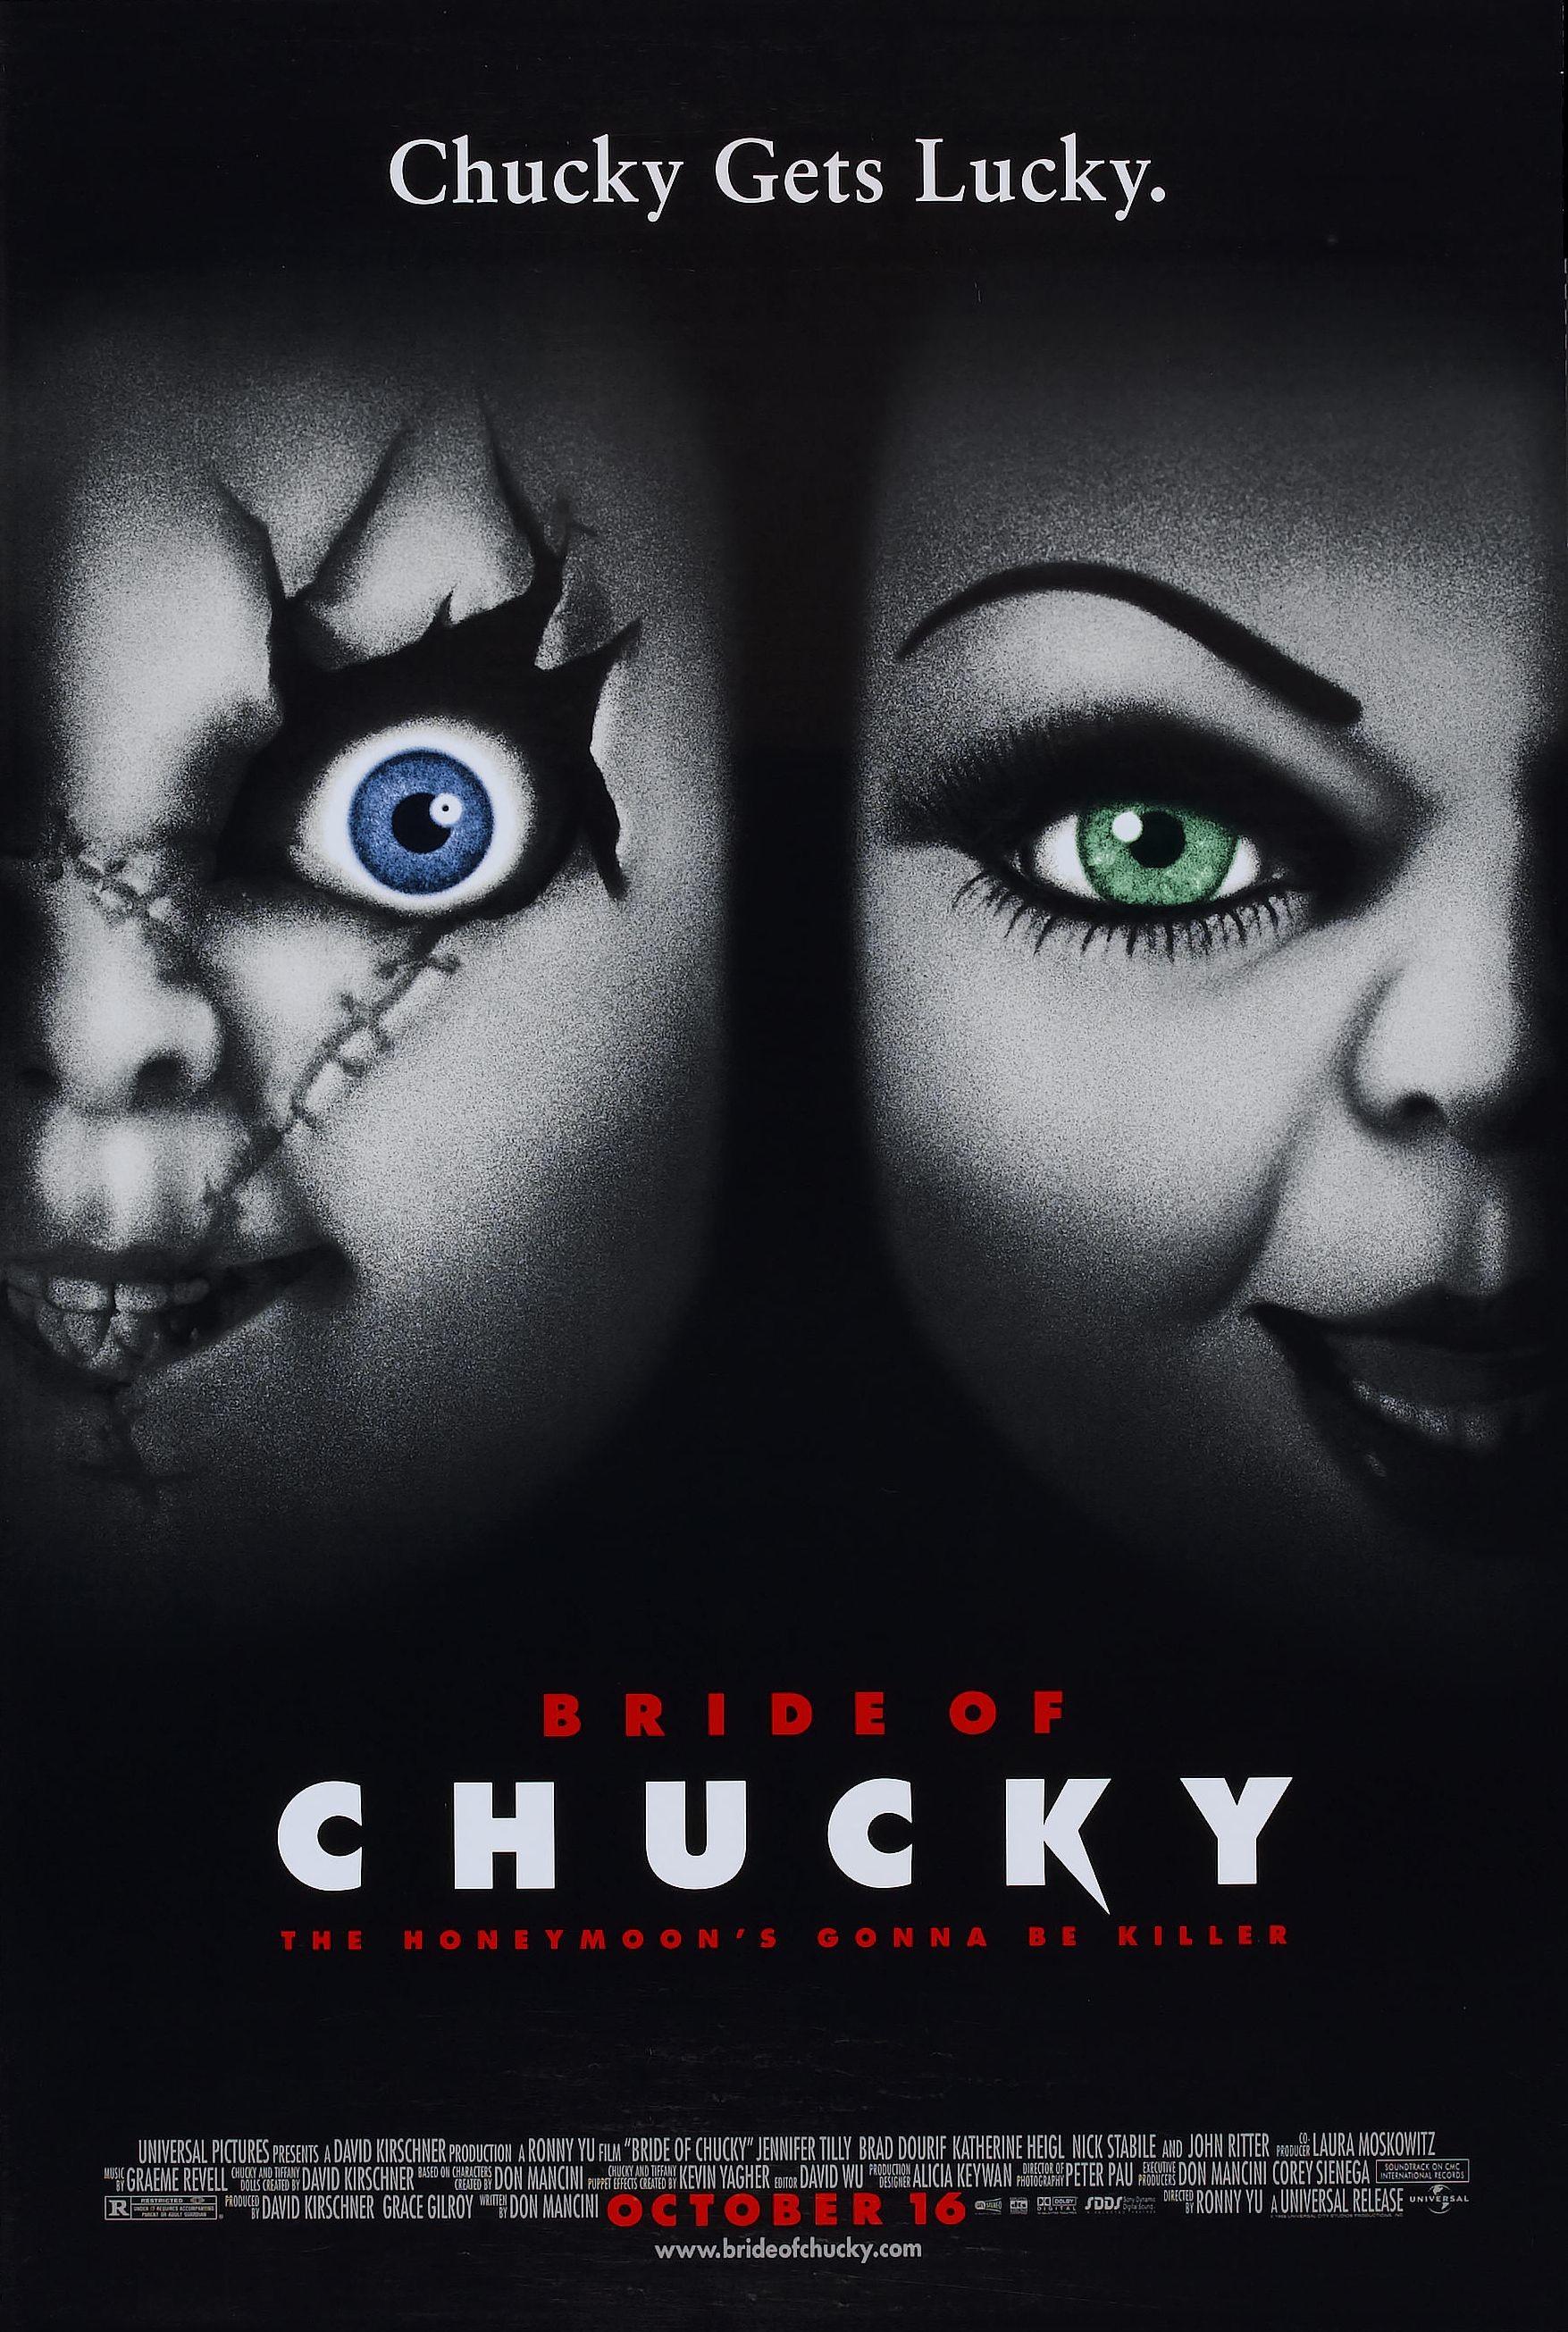 Bride-of-Chucky-poster-art-wallpaper-wp5005488